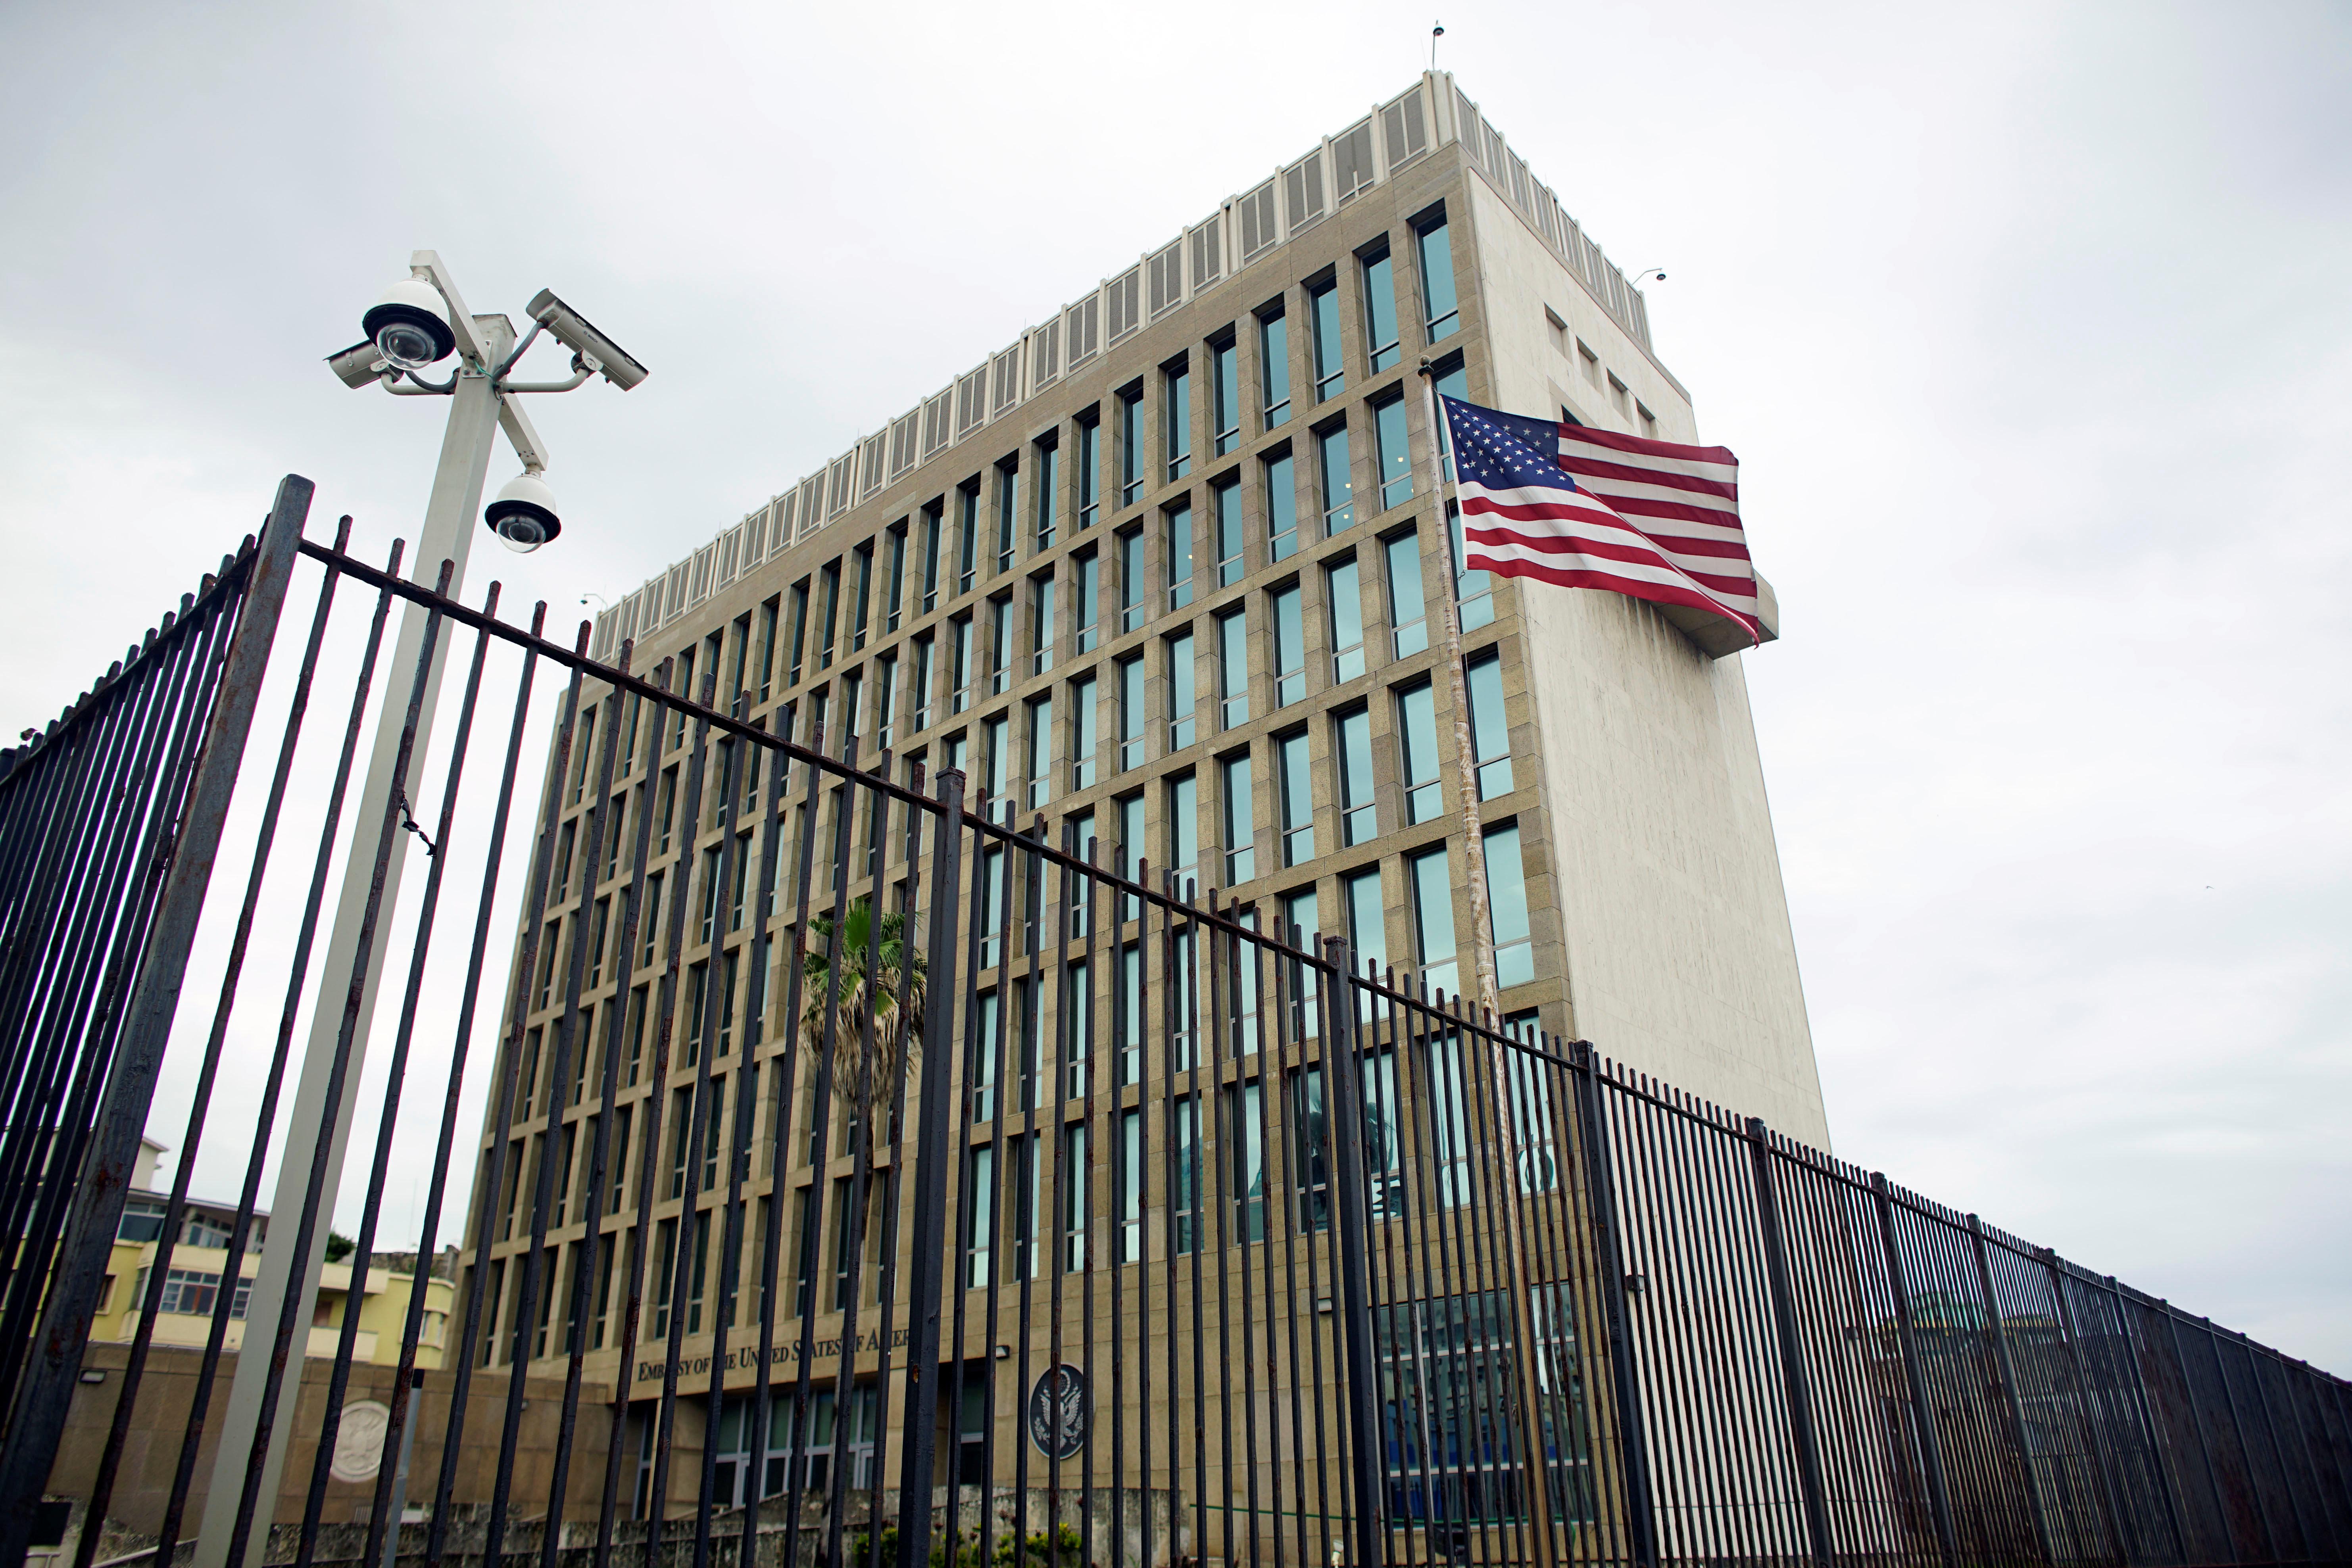 An exterior view of the U.S. Embassy is seen in Havana, Cuba, June 19, 2017. REUTERS/Alexandre Meneghini